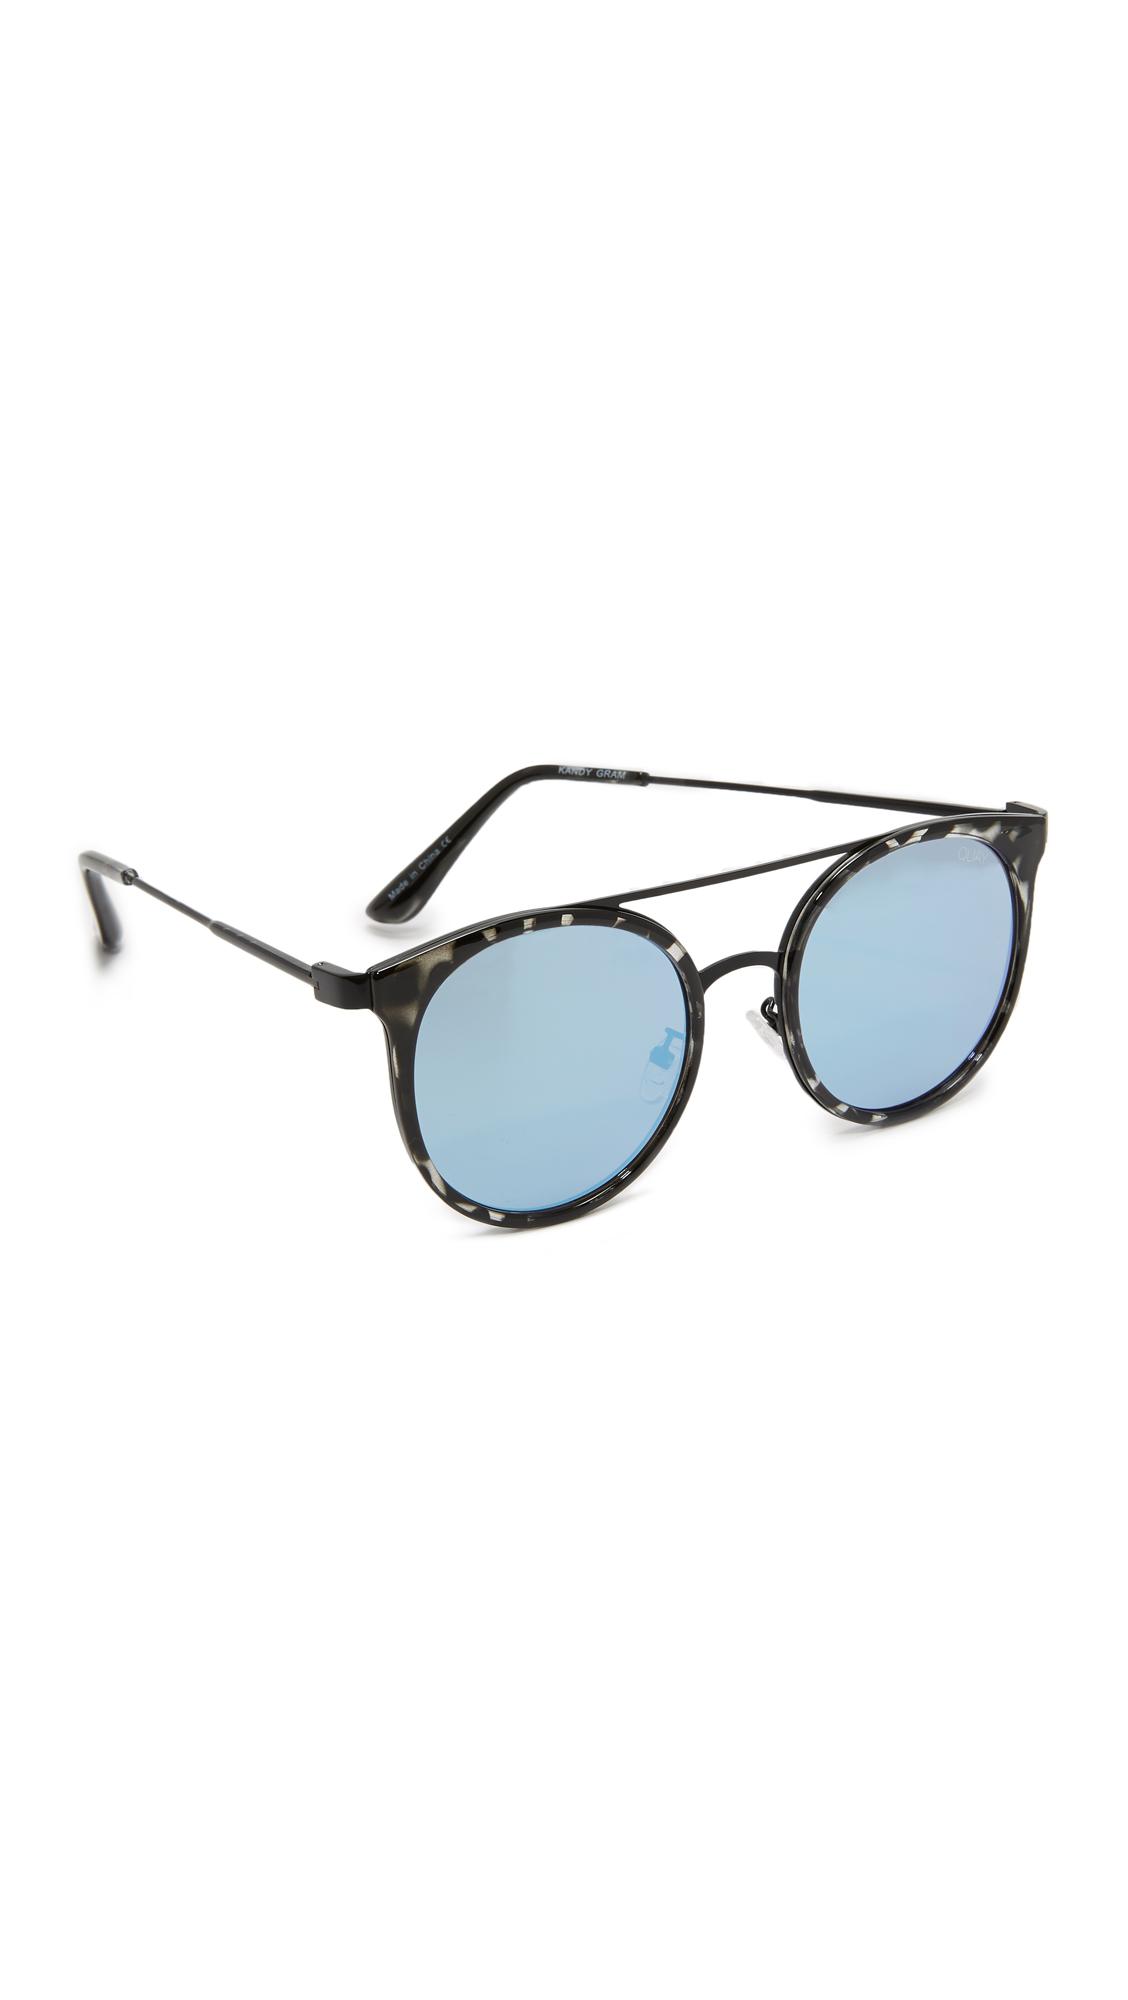 1b5227b0caace Quay Kandy Gram Sunglasses